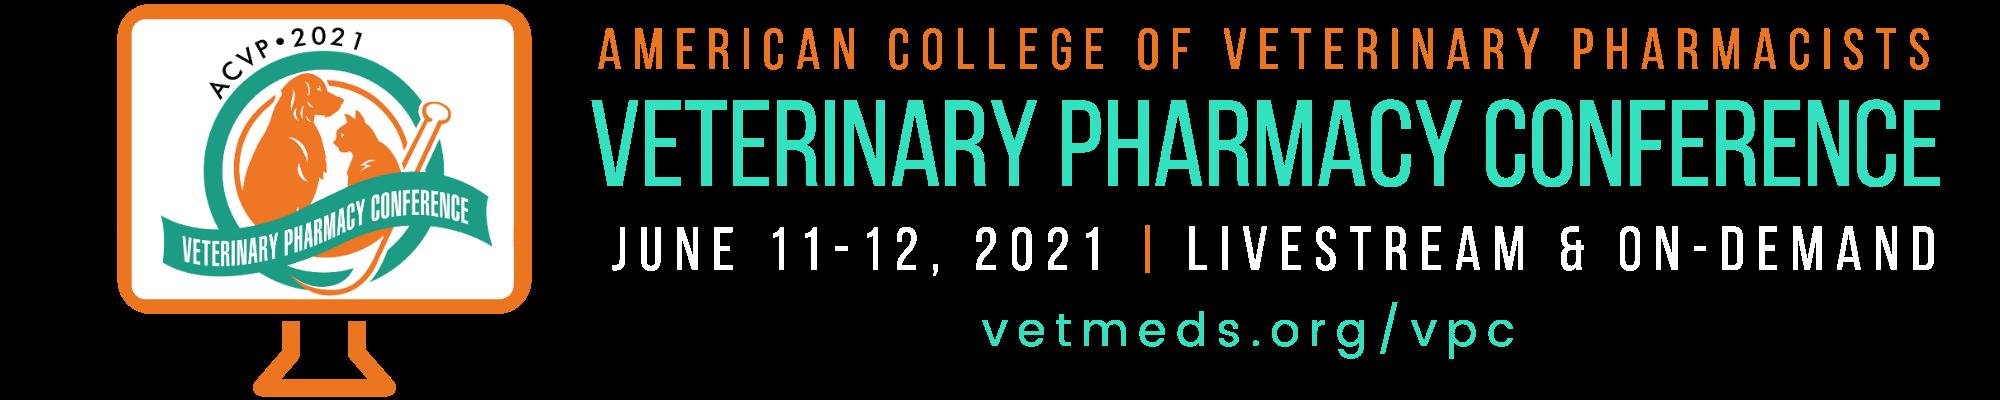 VPC 2021 Banner